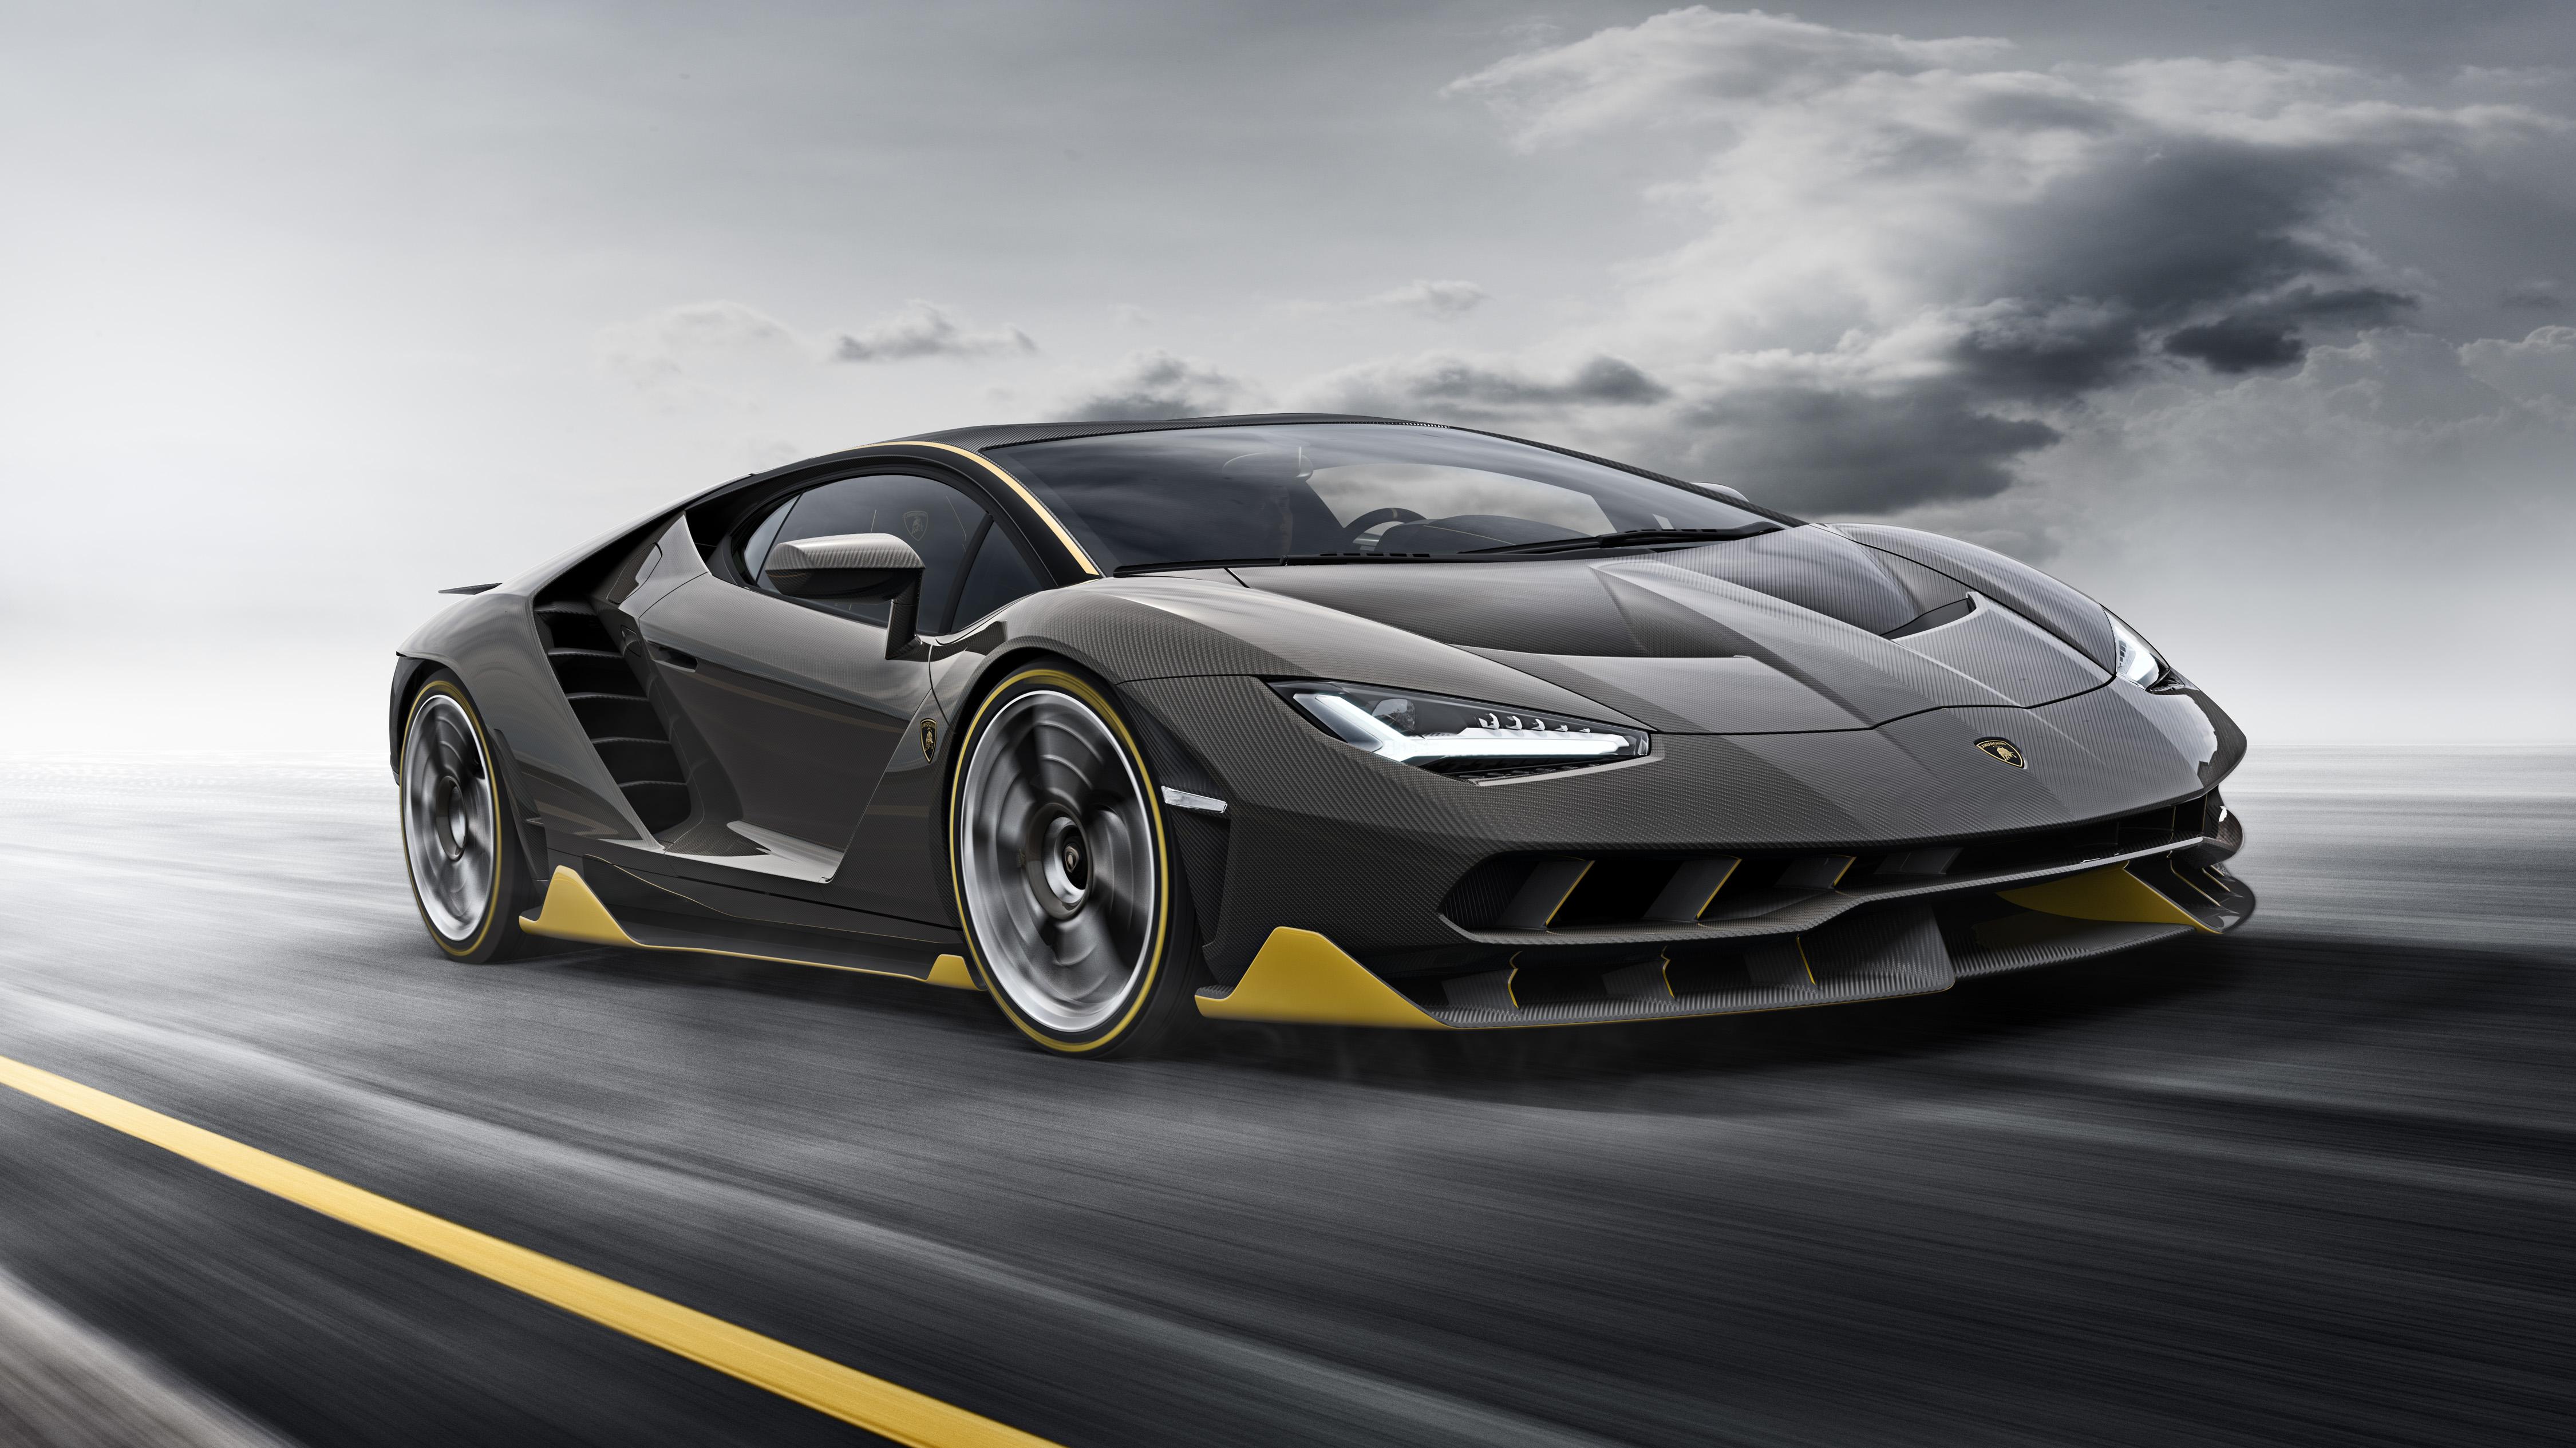 New Xbox Forza Game Cover Car The Lamborghini Centenario Eftm